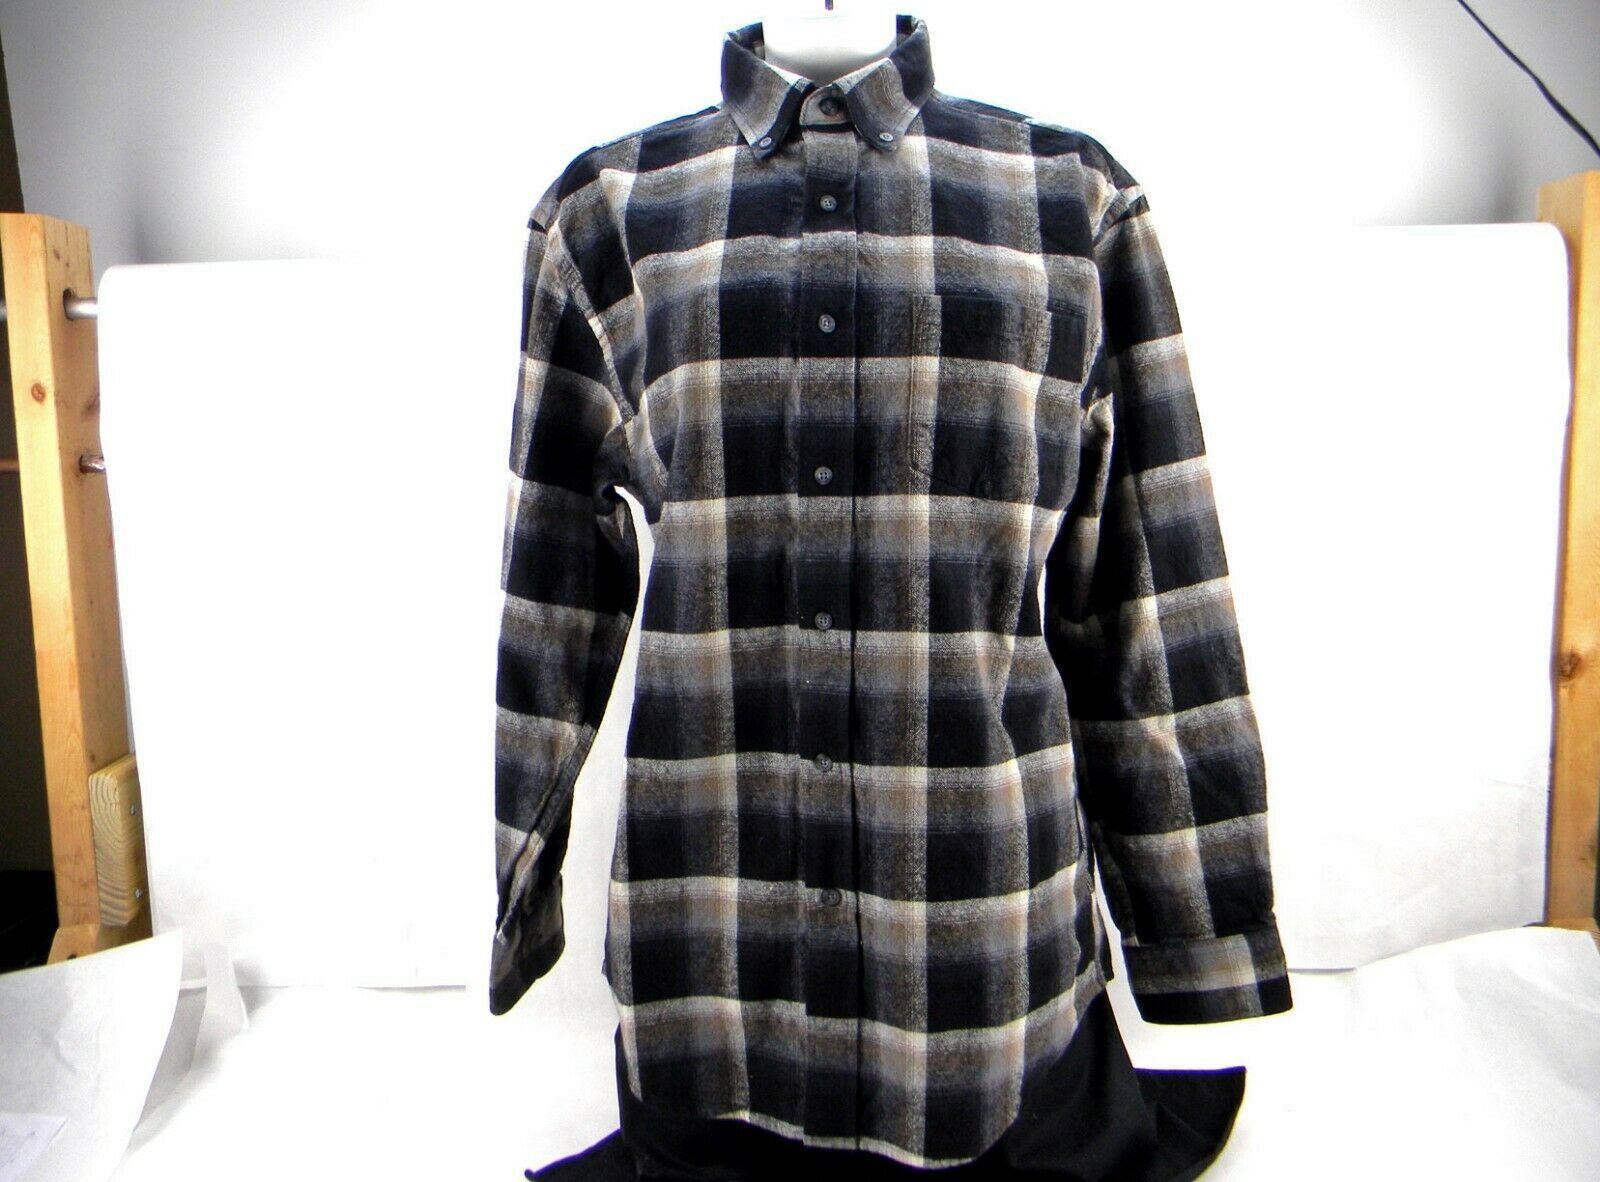 New Pendleton Mason Black Brown Ombre Plaid Long Sleeve Flannel Men's M Shirt